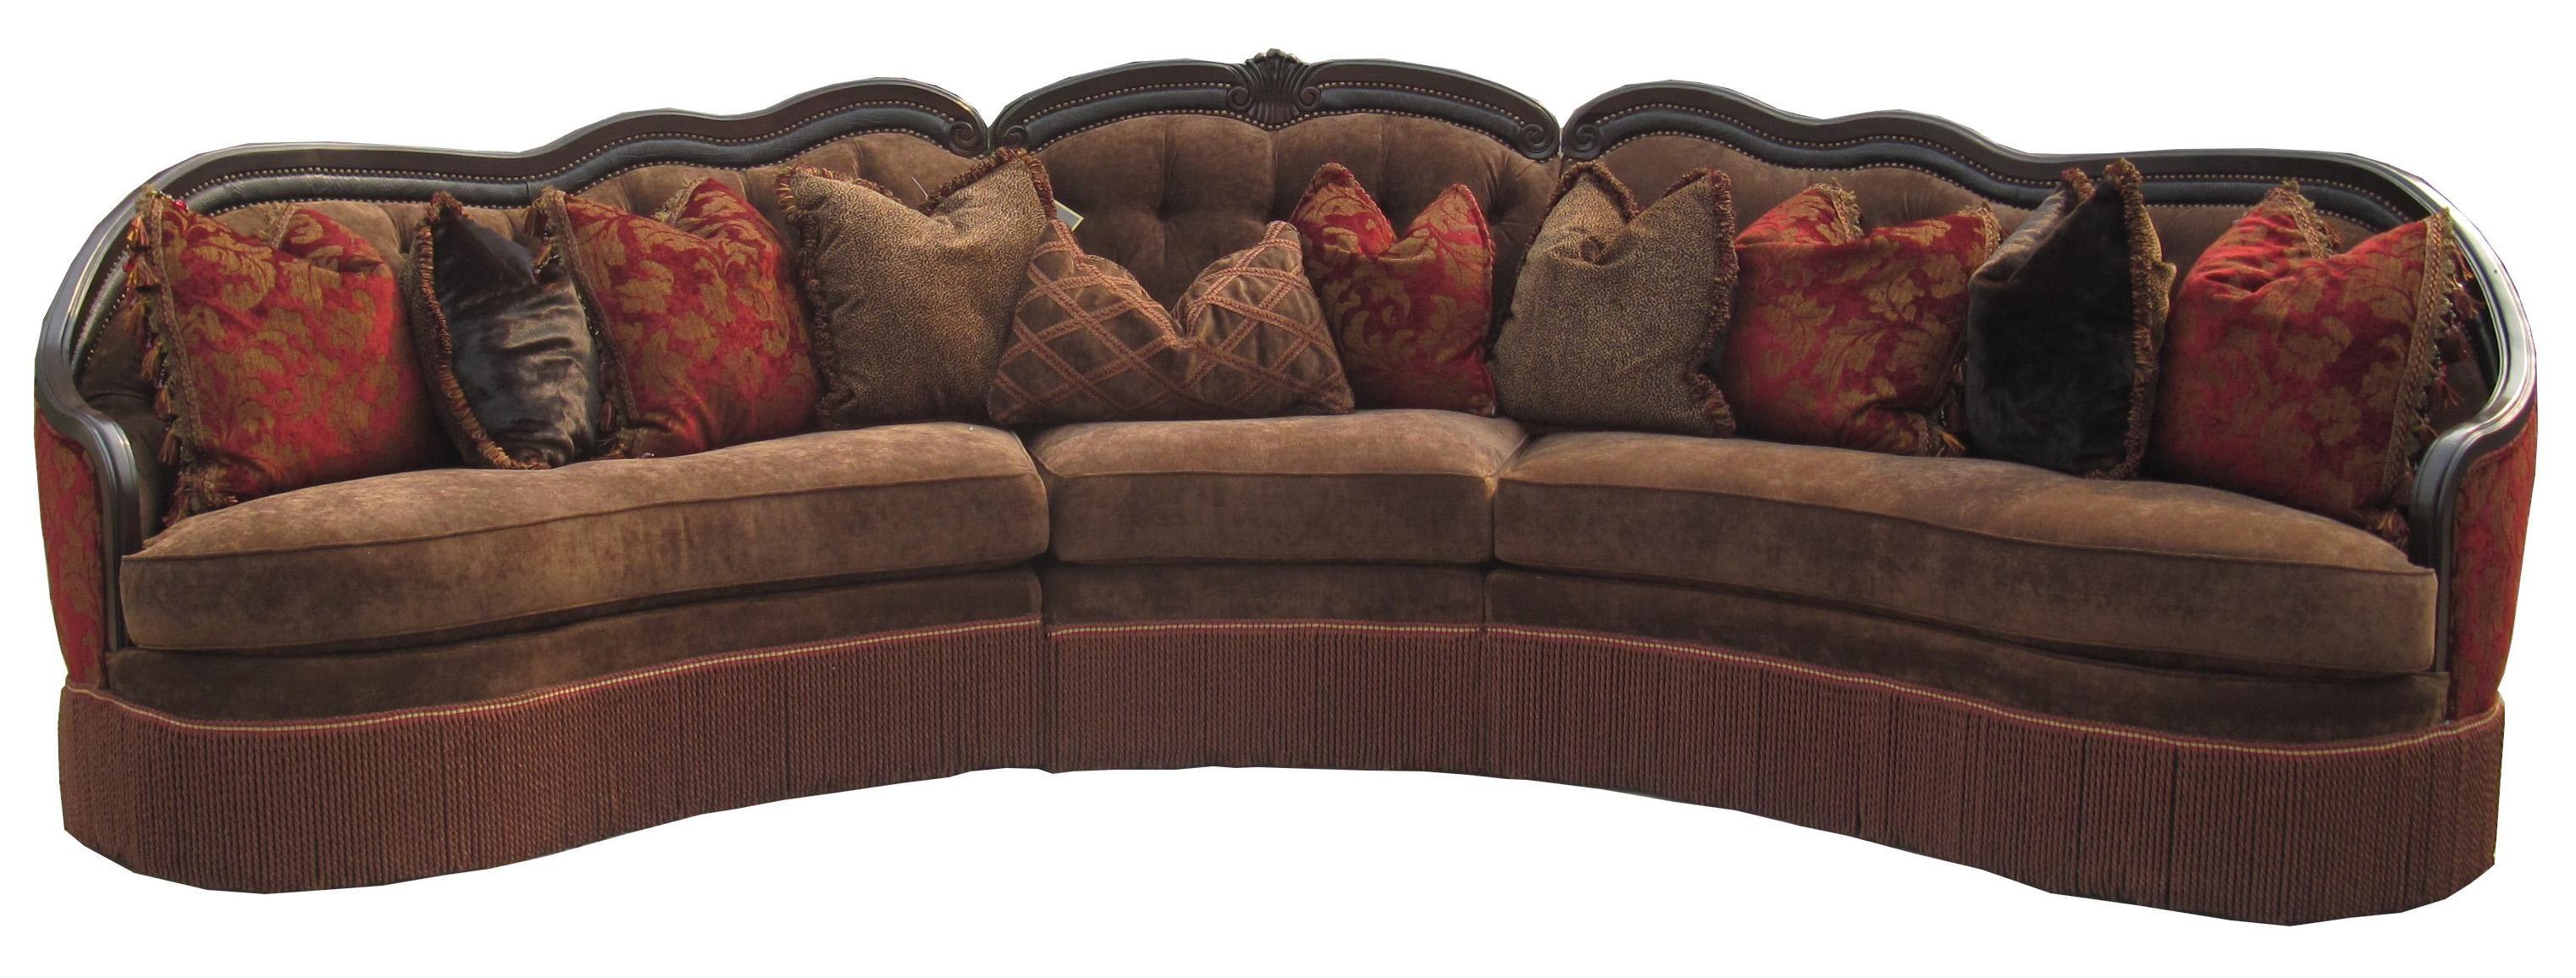 Rachlin Classics Gigi Traditional Three Piece Sectional Sofa With  Decorative Seat Back And Fringe Skirt   Olindeu0027s Furniture   Sofa Sectiona.